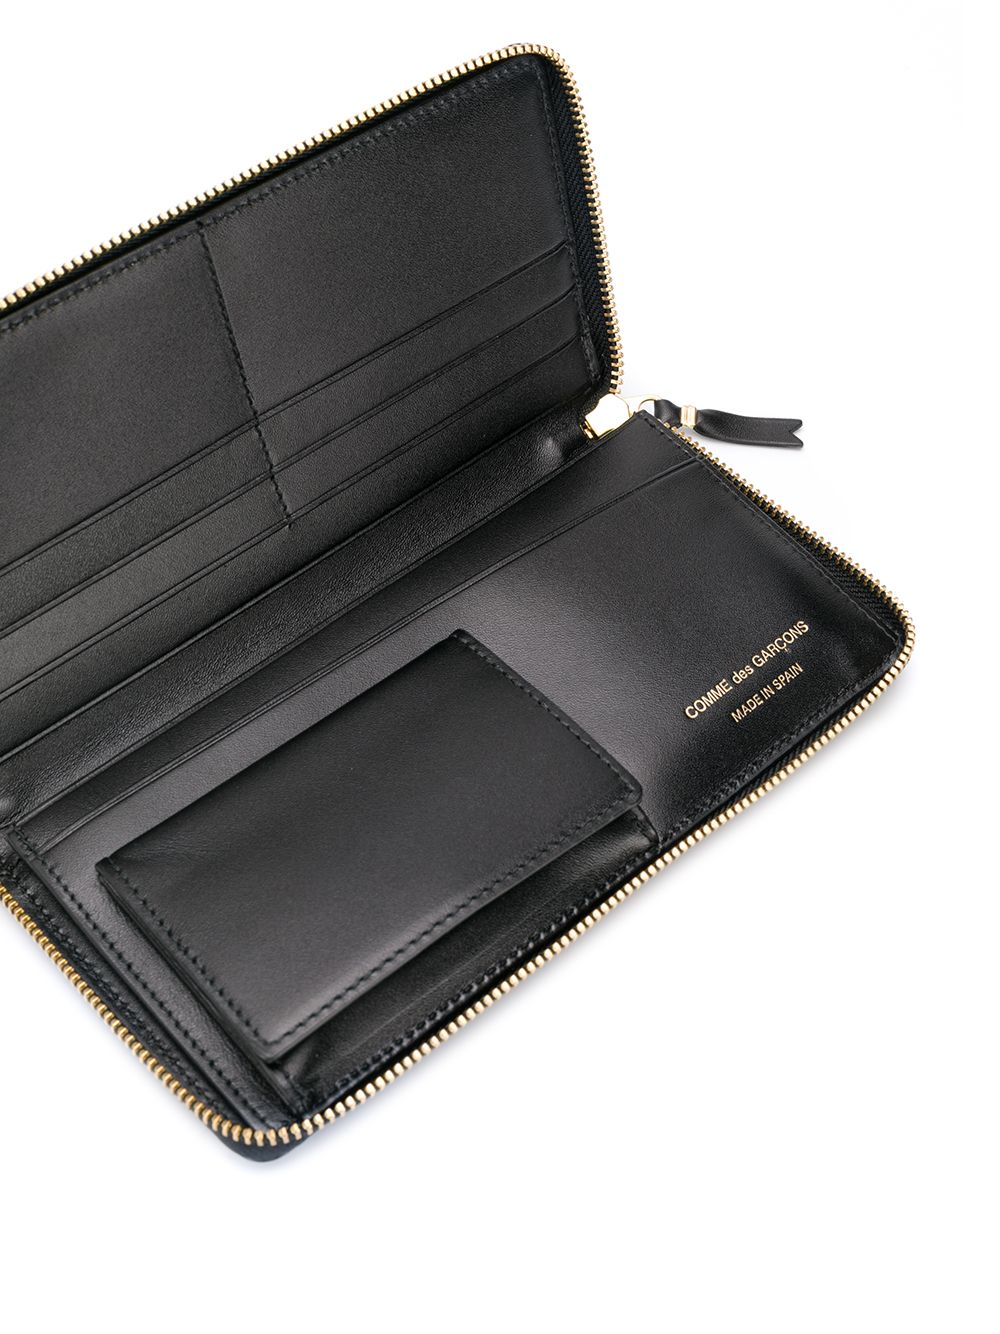 portafoglio classic line unisex nero in pelle COMME DES GARÇONS WALLET | Portafogli | SA0110800